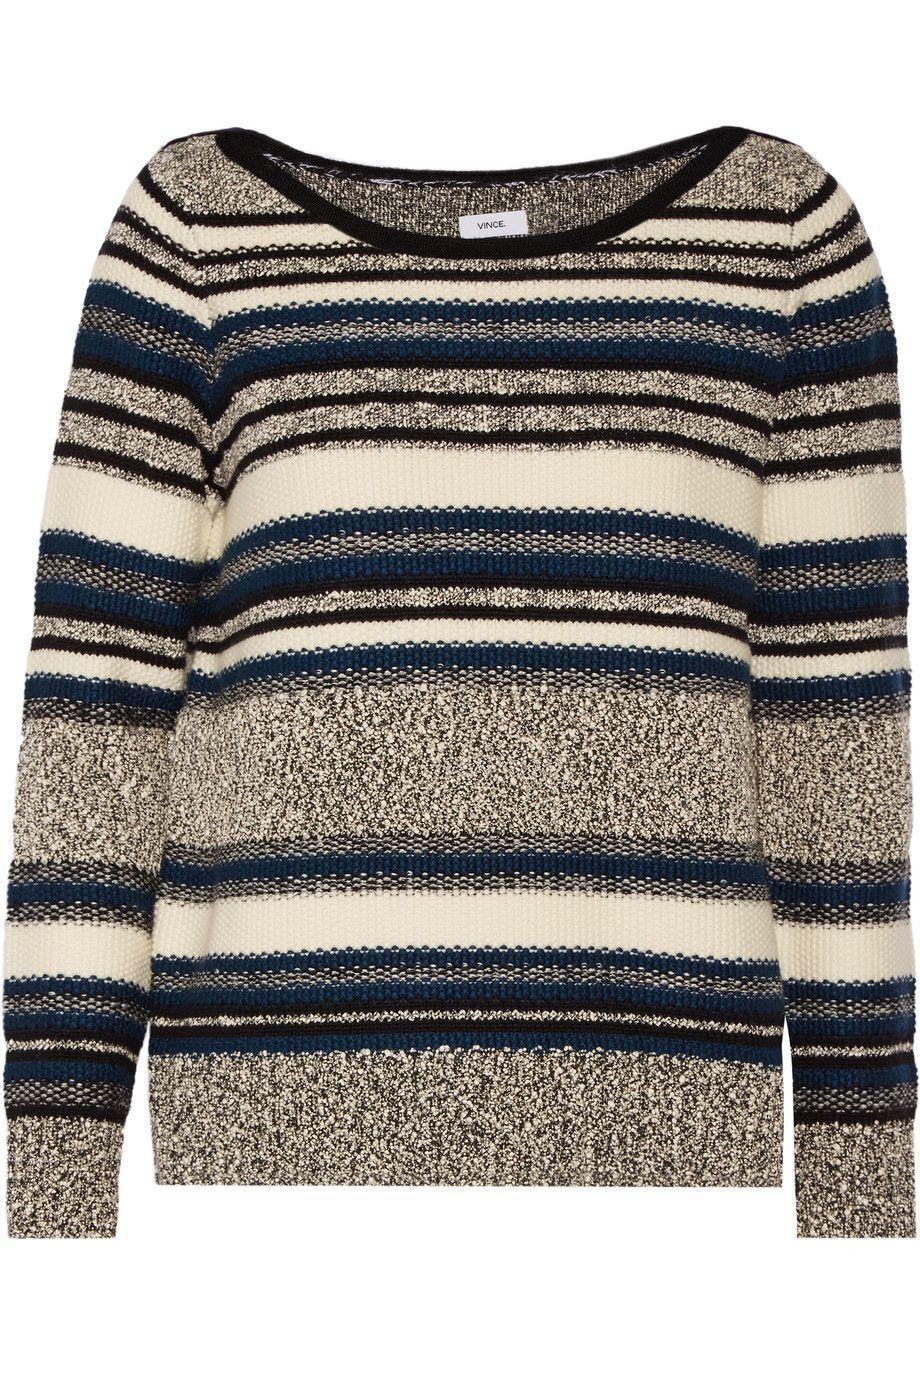 VINCE Bouclé-trimmed wool-blend sweater. #vince #cloth #sweater